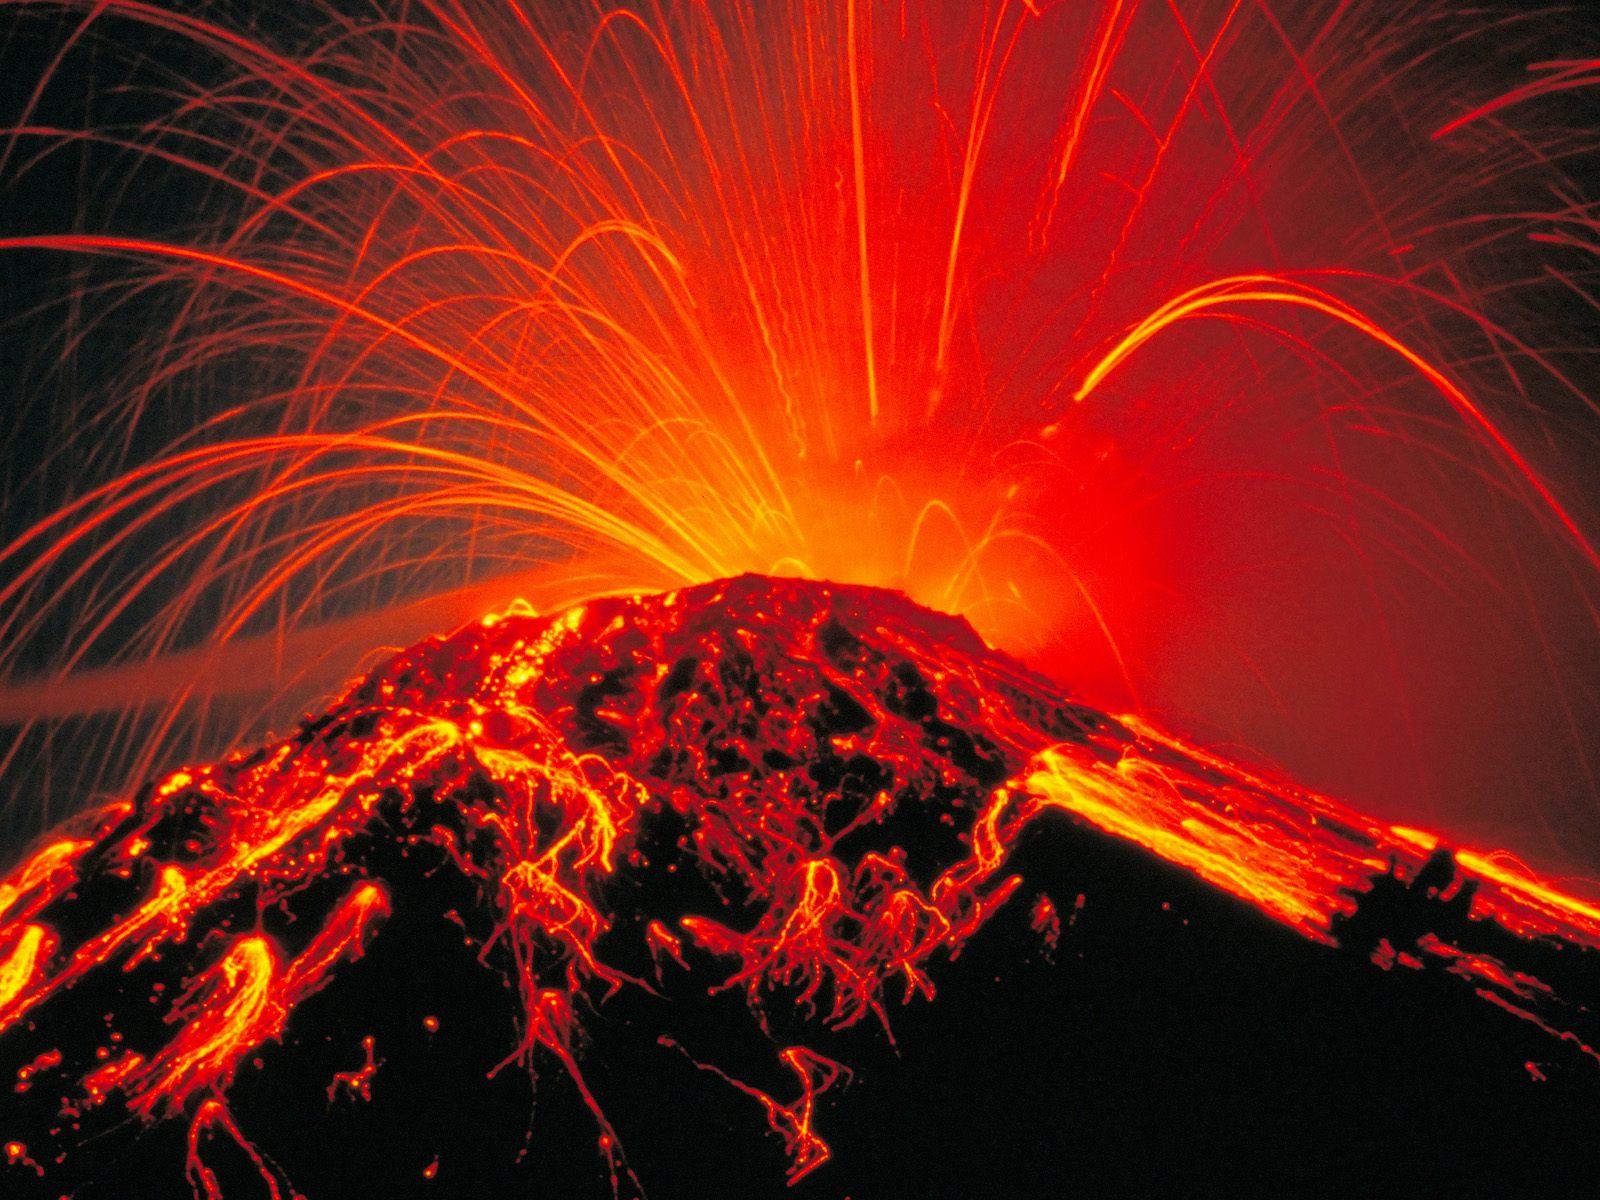 Volcan en éruption (c)gentside.com/